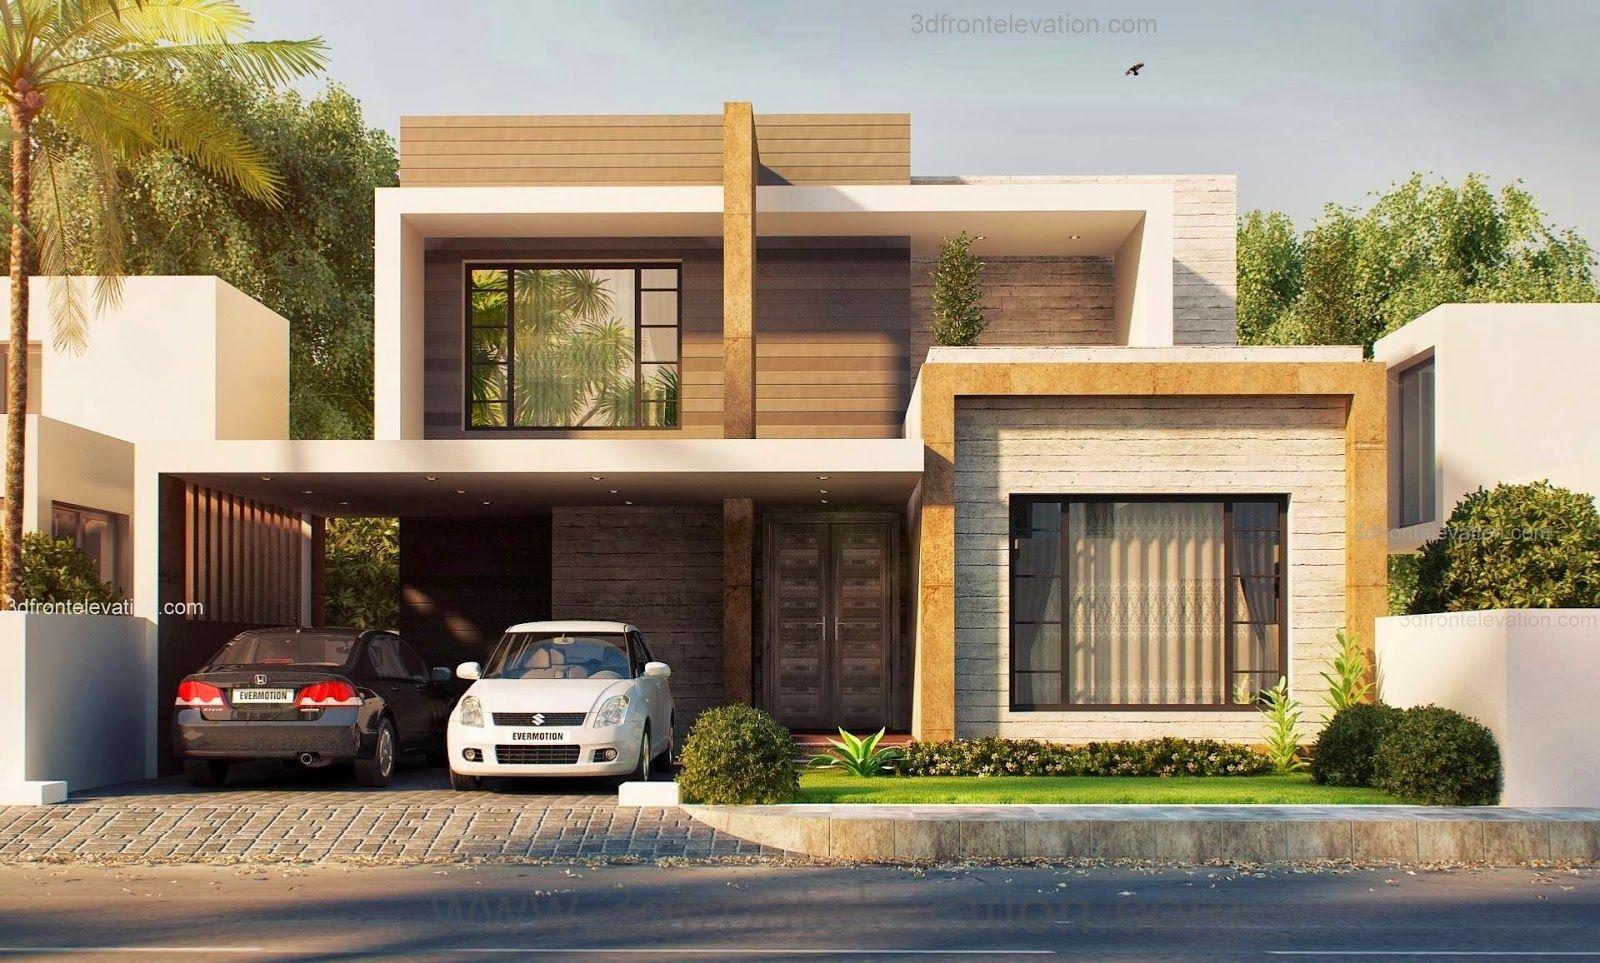 10 Marla Home Front Design In Pakistan Valoblogi Com